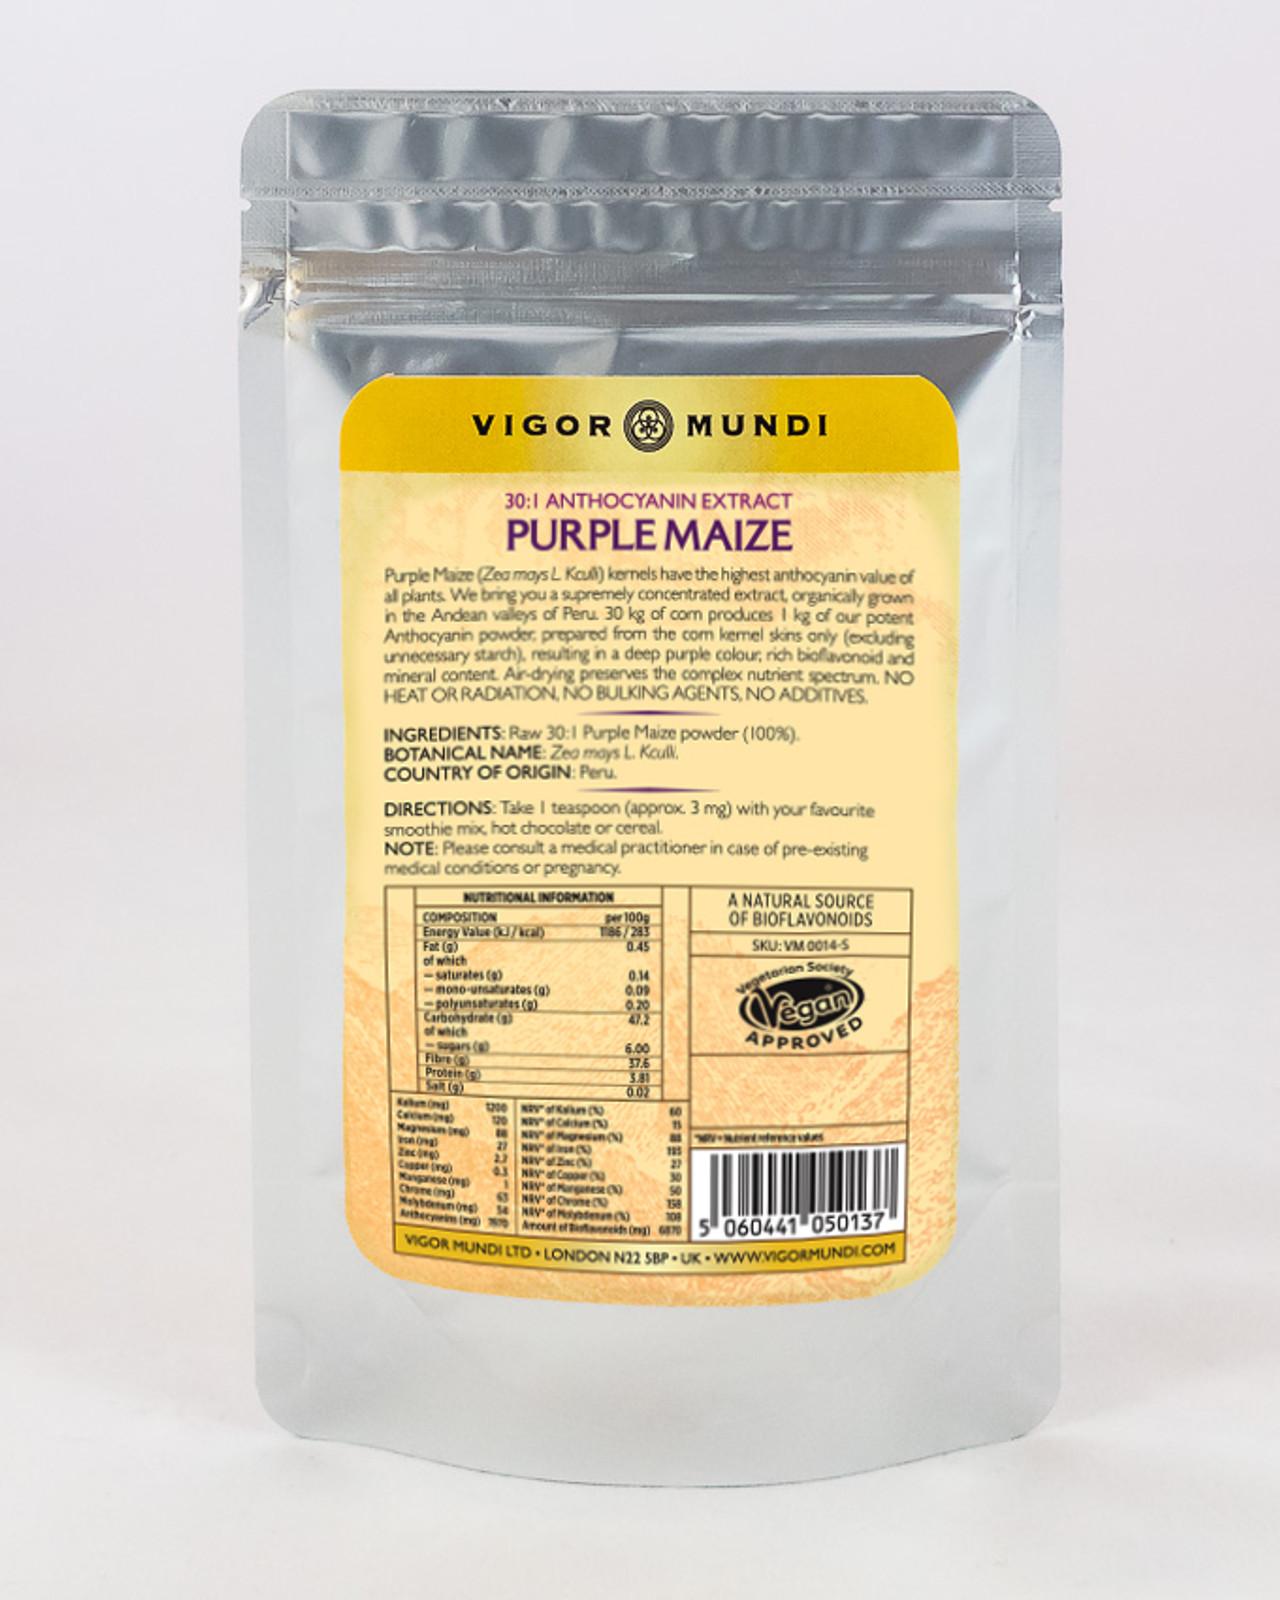 Order 100 g organically grown Purple Corn or Purple Maize from Peru online at Vigor Mundi